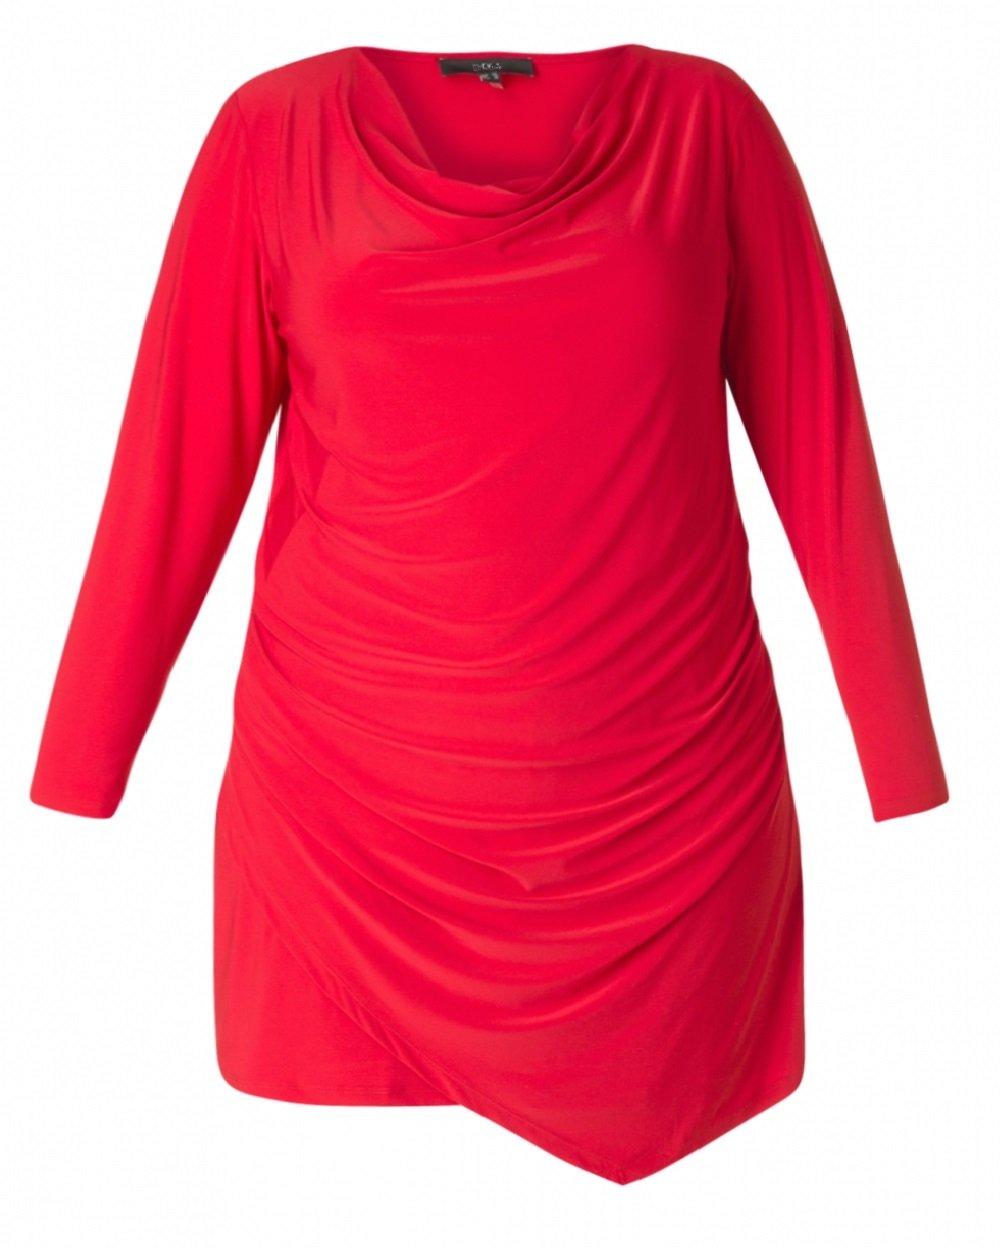 Smuk rød kjole med draperinger og vandfaldseffekt